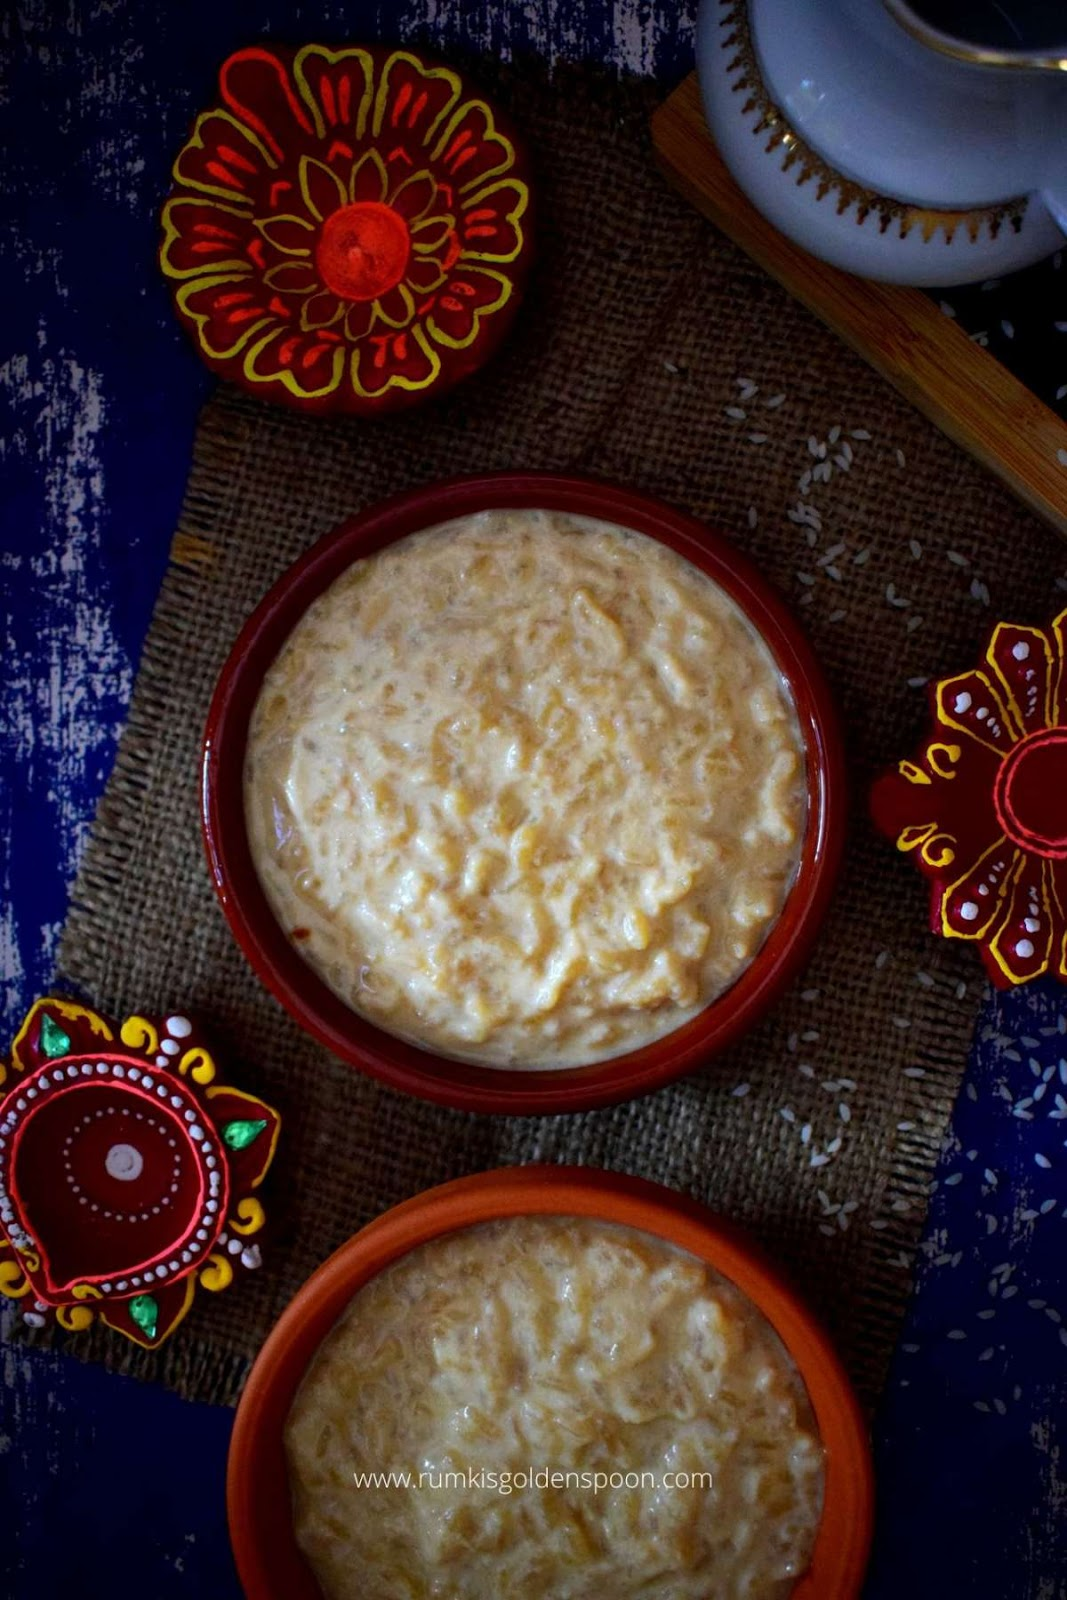 khejur gurer payesh, patali gur recipes, sweets with jaggery, jaggery sweet recipes, gur ki kheer, rice kheer recipe, kheer recipe, bengali kheer recipe, gurer payesh recipe Bengali, bengali rice payesh recipe, khejur gurer payesh recipe, nolen gurer payesh recipe, date palm jaggery recipes, patali gurer payesh, patali gurer payesh recipe, indian sweet recipes for Diwali, jaggery sweet recipes, sweet recipes with jaggery, patali gur recipes, jaggery sweet, sweets with jaggery, Rumki's Golden Spoon